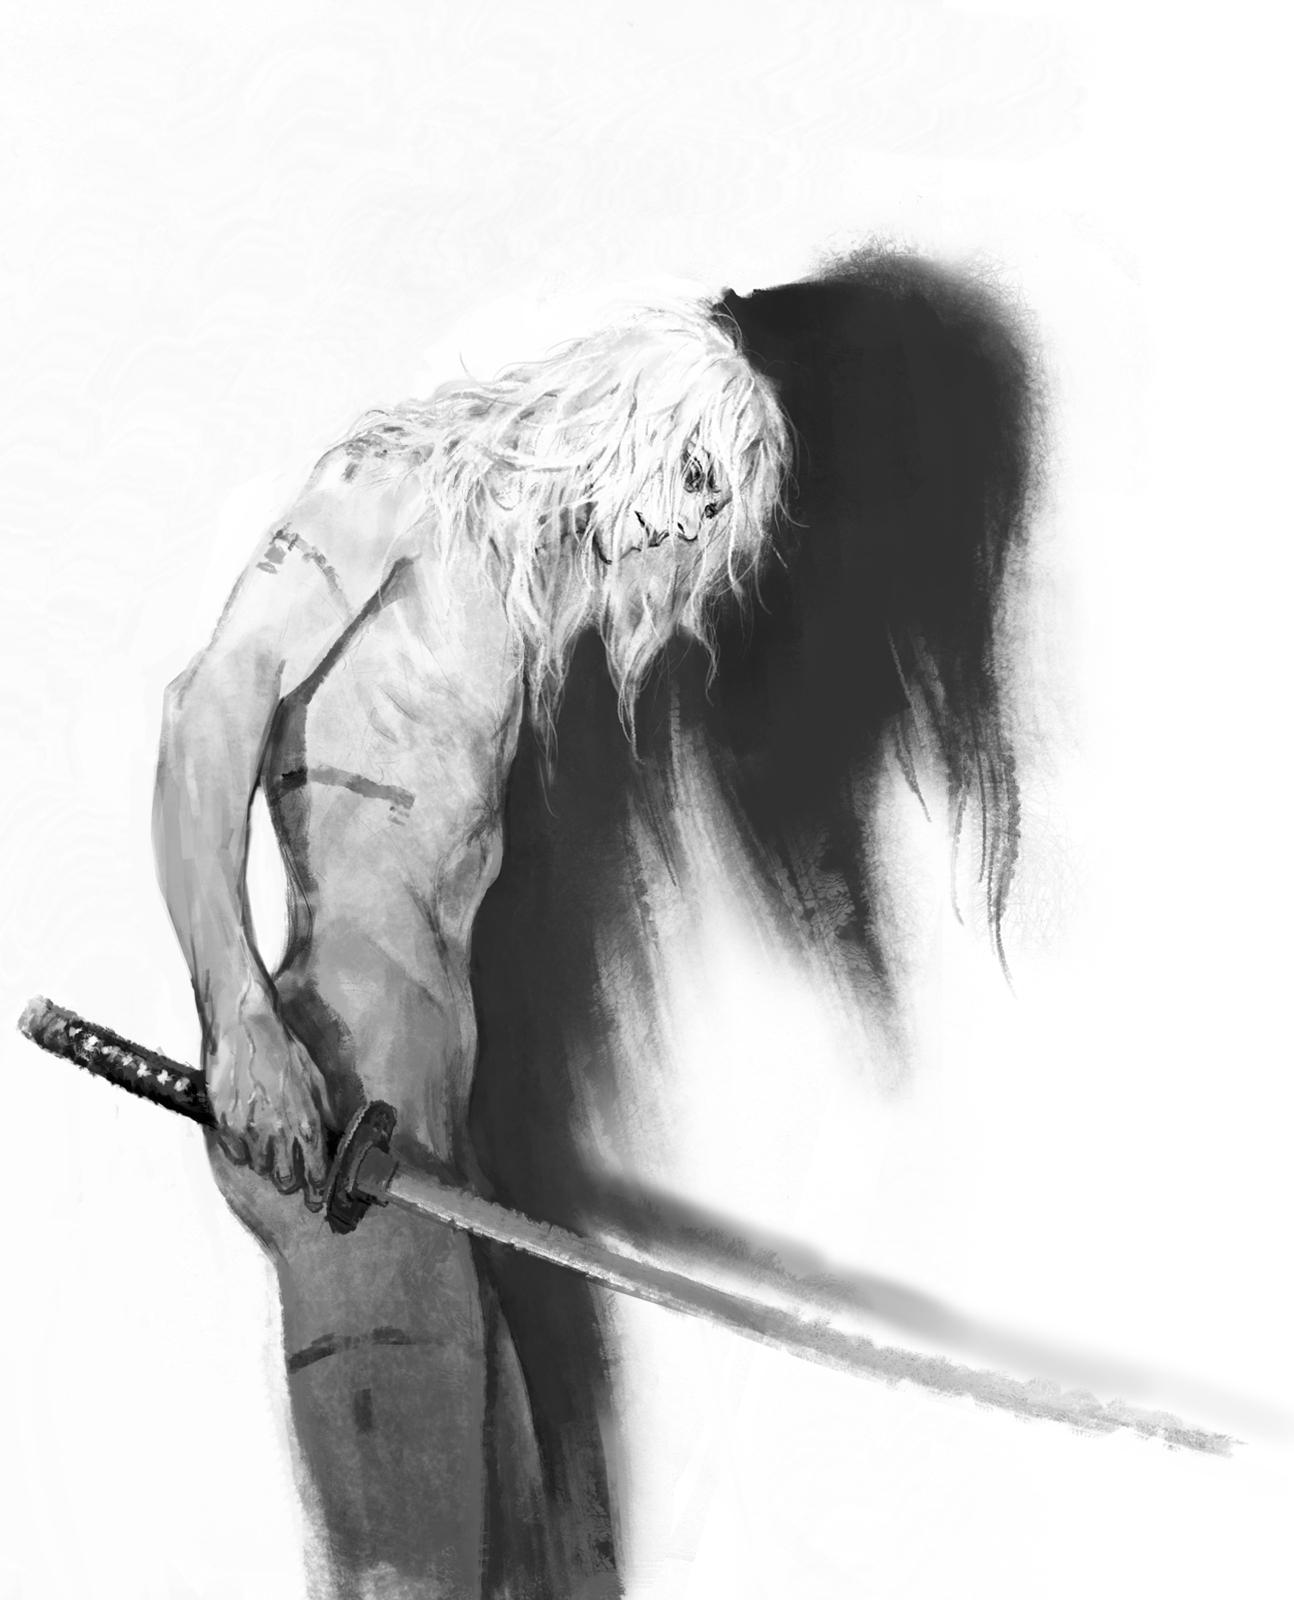 white_devil_by_rogner5th-d7igxxz.jpg